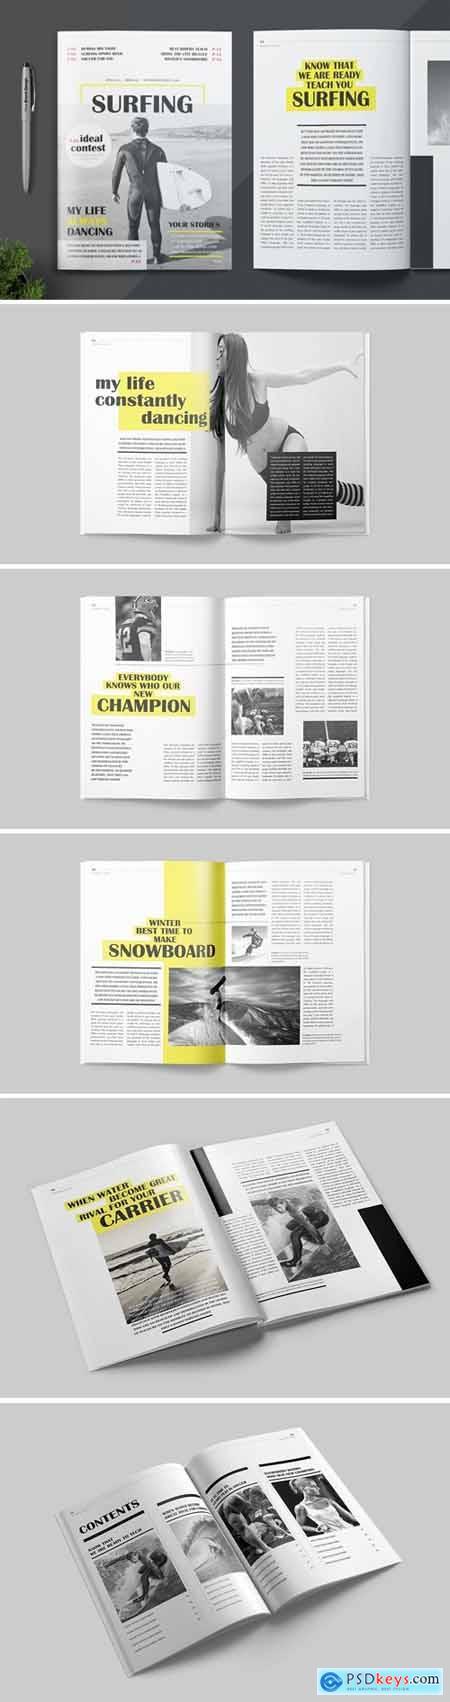 Magazine Template REBSDWX